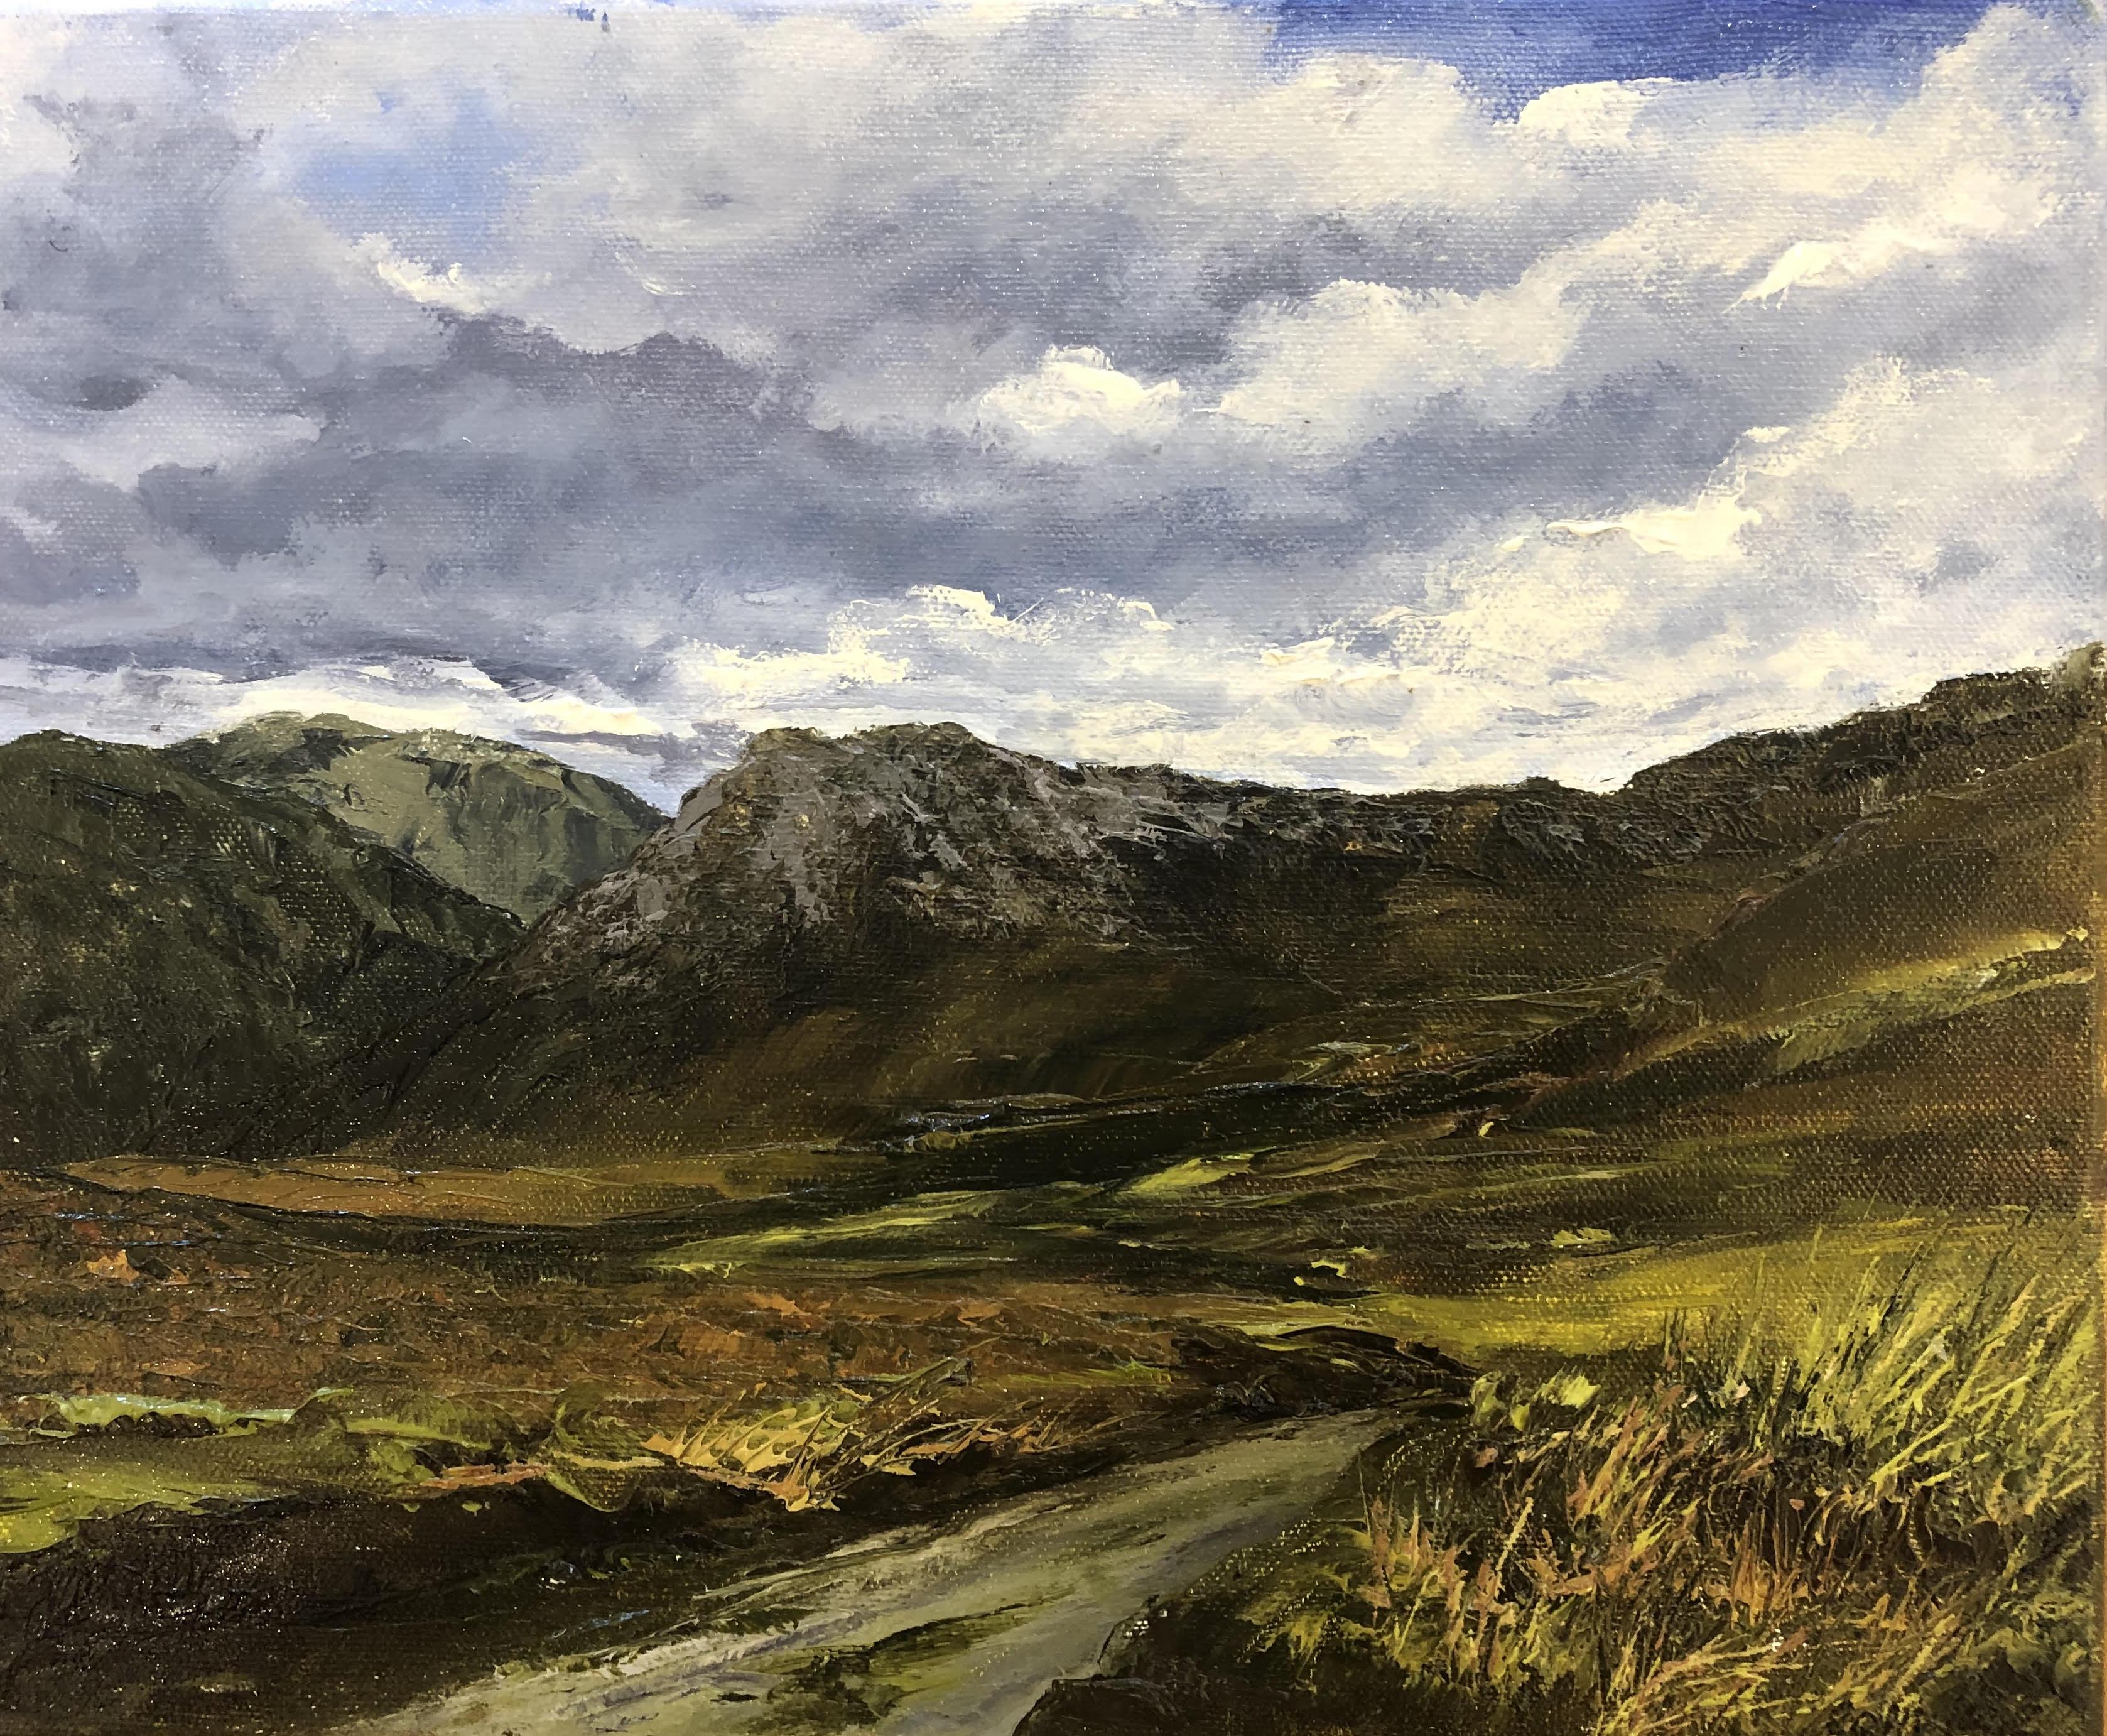 Baunoge Bog, High in the Mountains by Eoin Lane